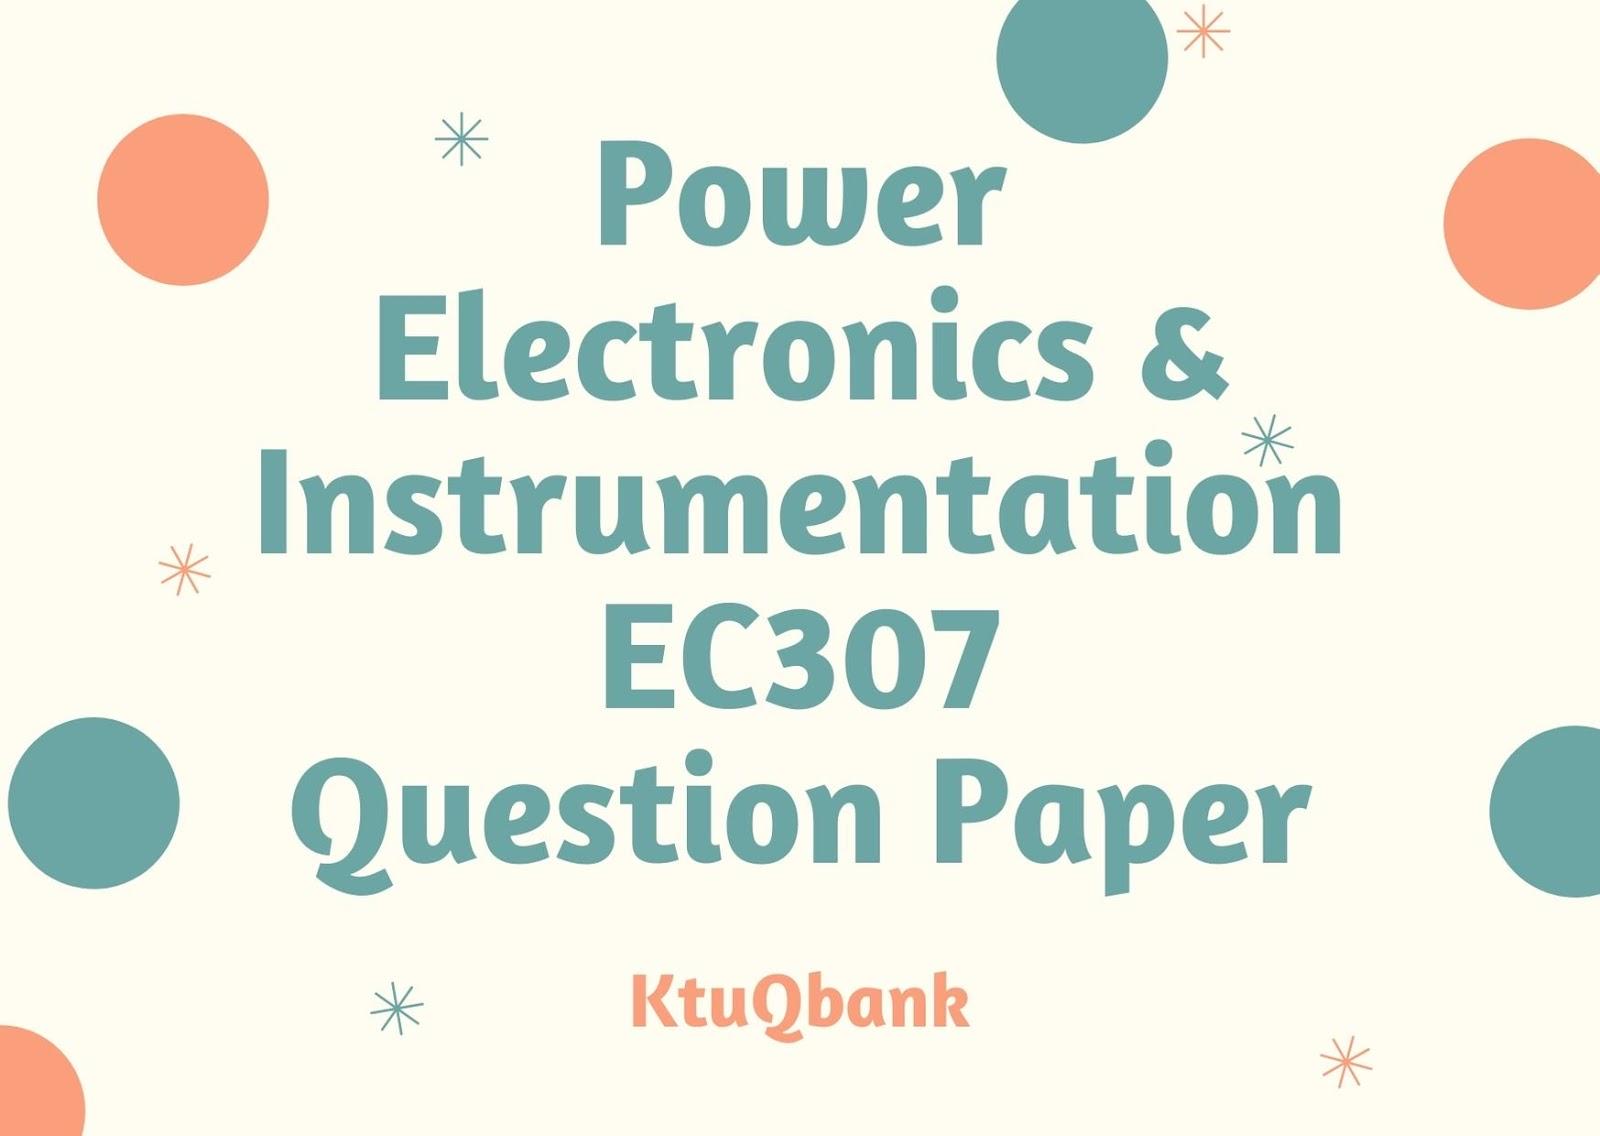 Power Electronics & Instrumentation | EC307 | Question Papers (2015 batch)